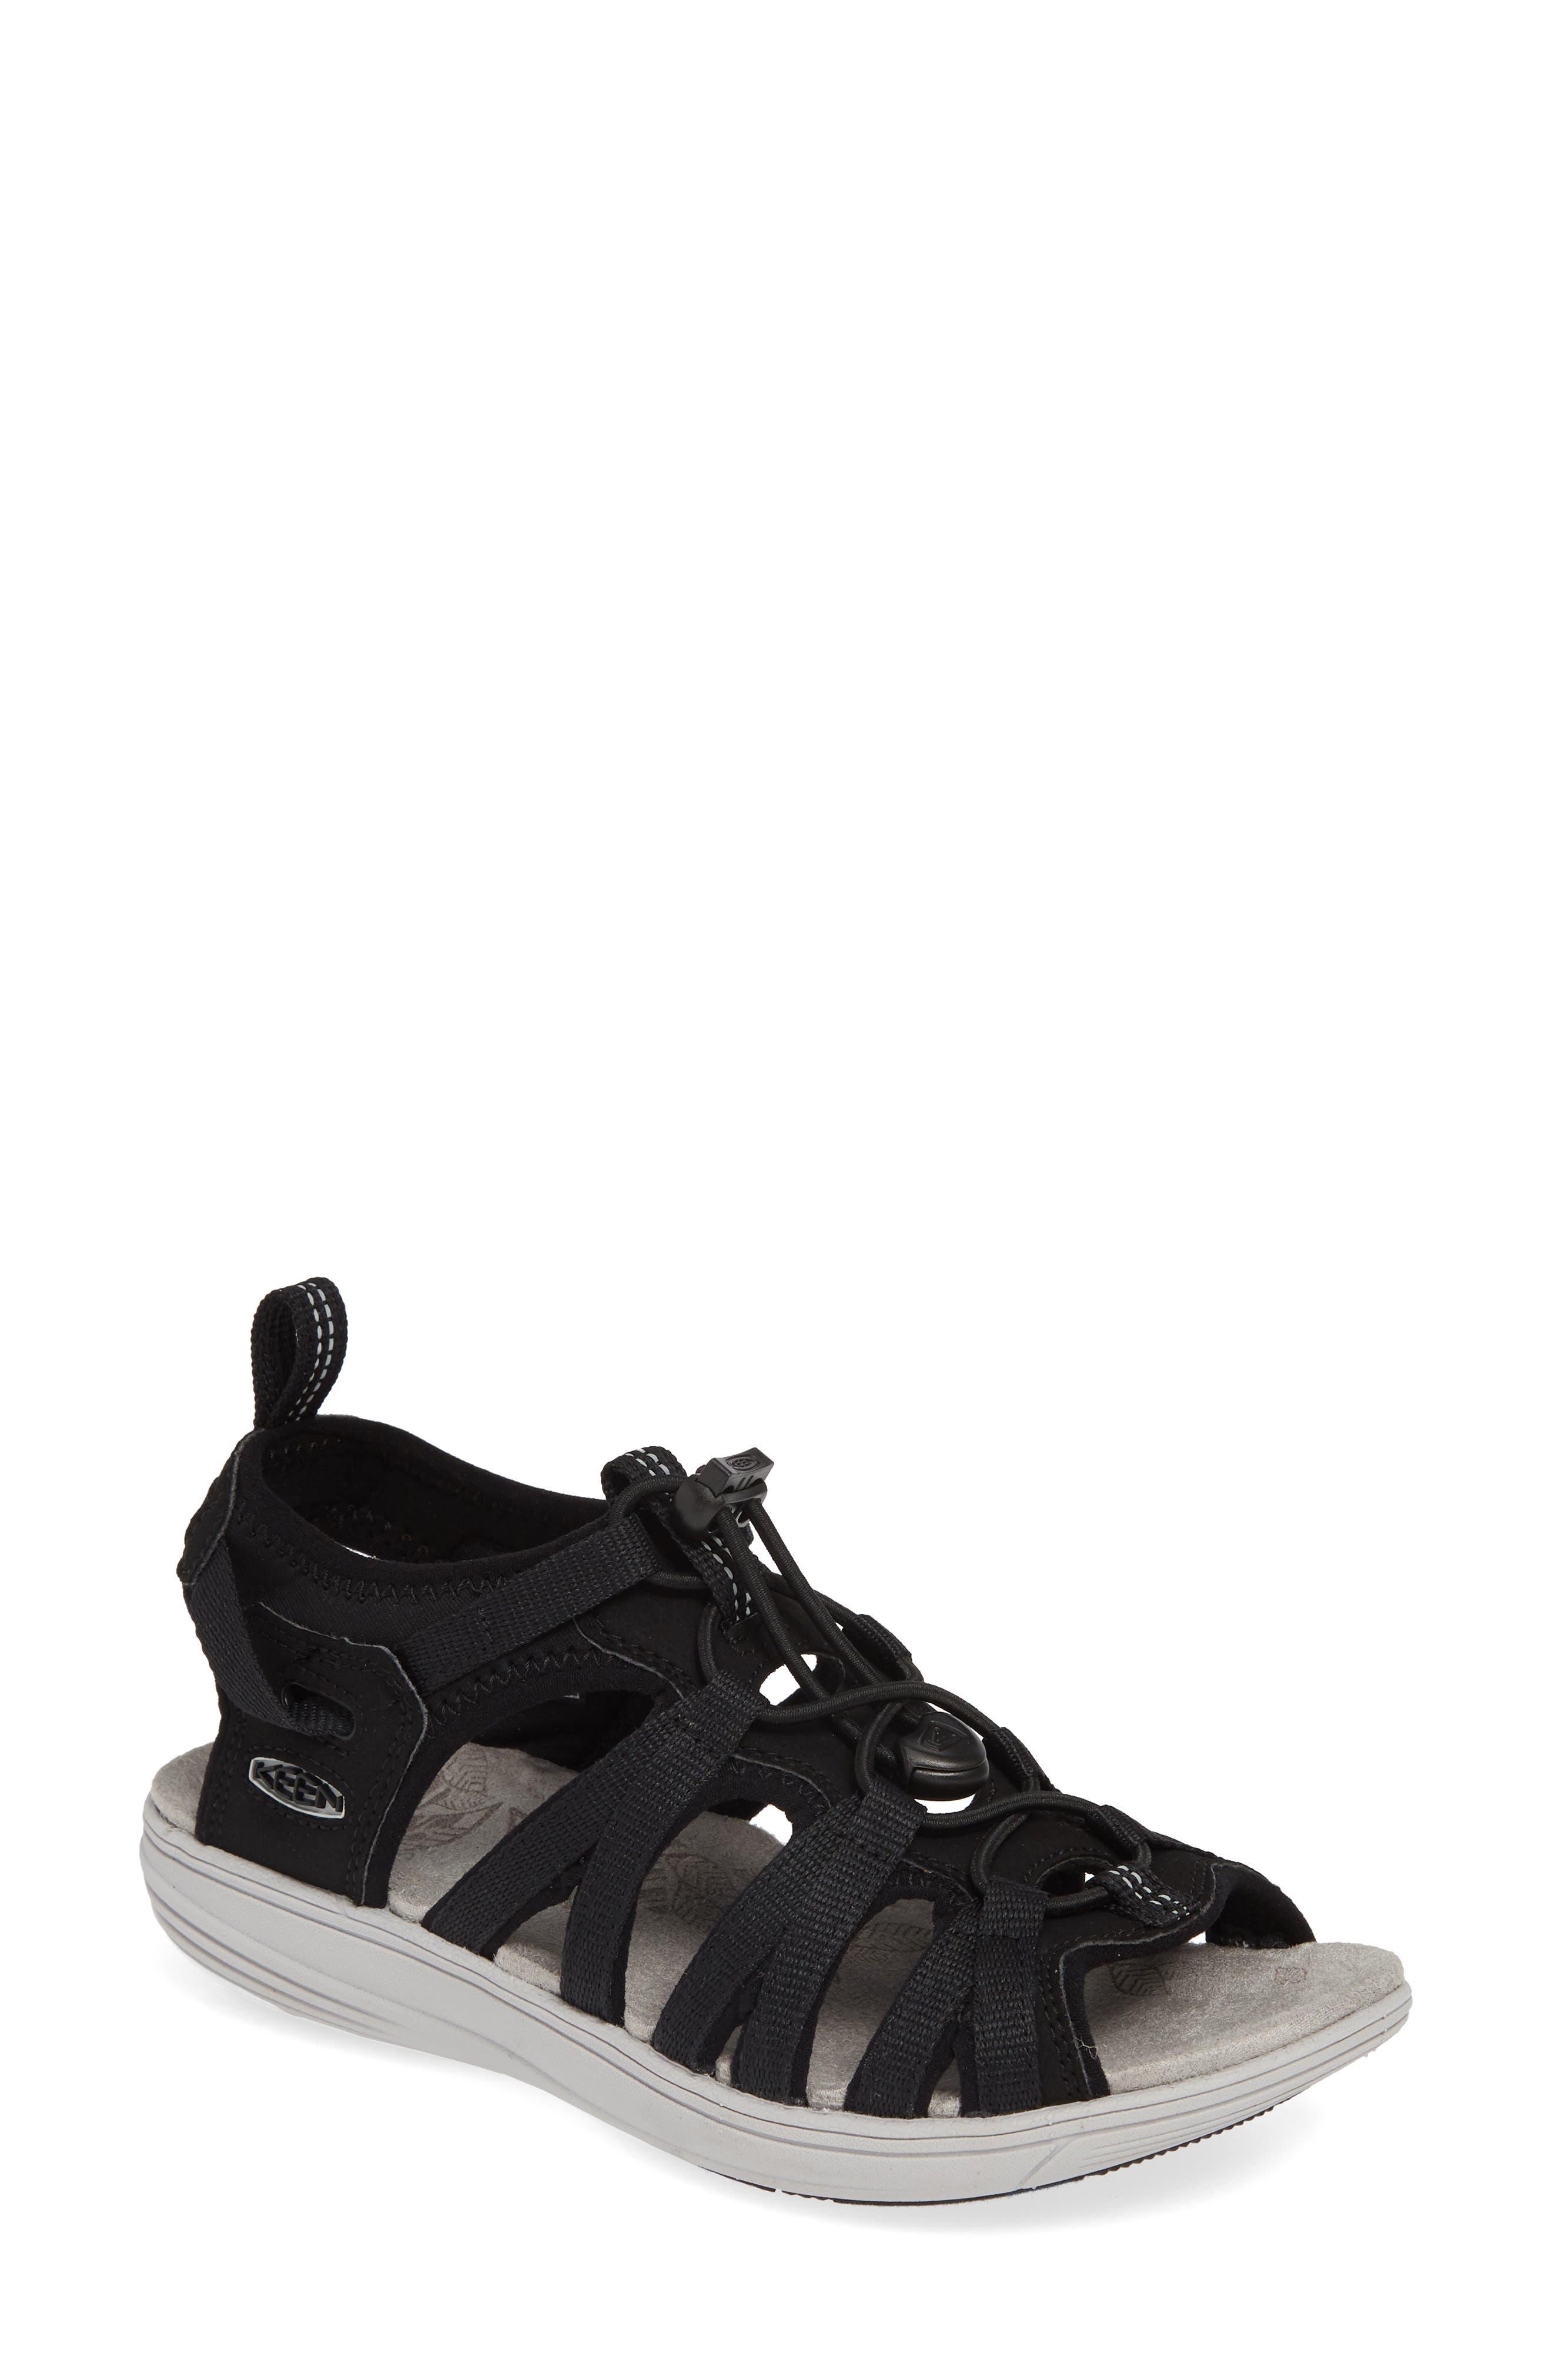 KEEN Damaya Lattice Sandal, Main, color, BLACK/ VAPOR FABRIC